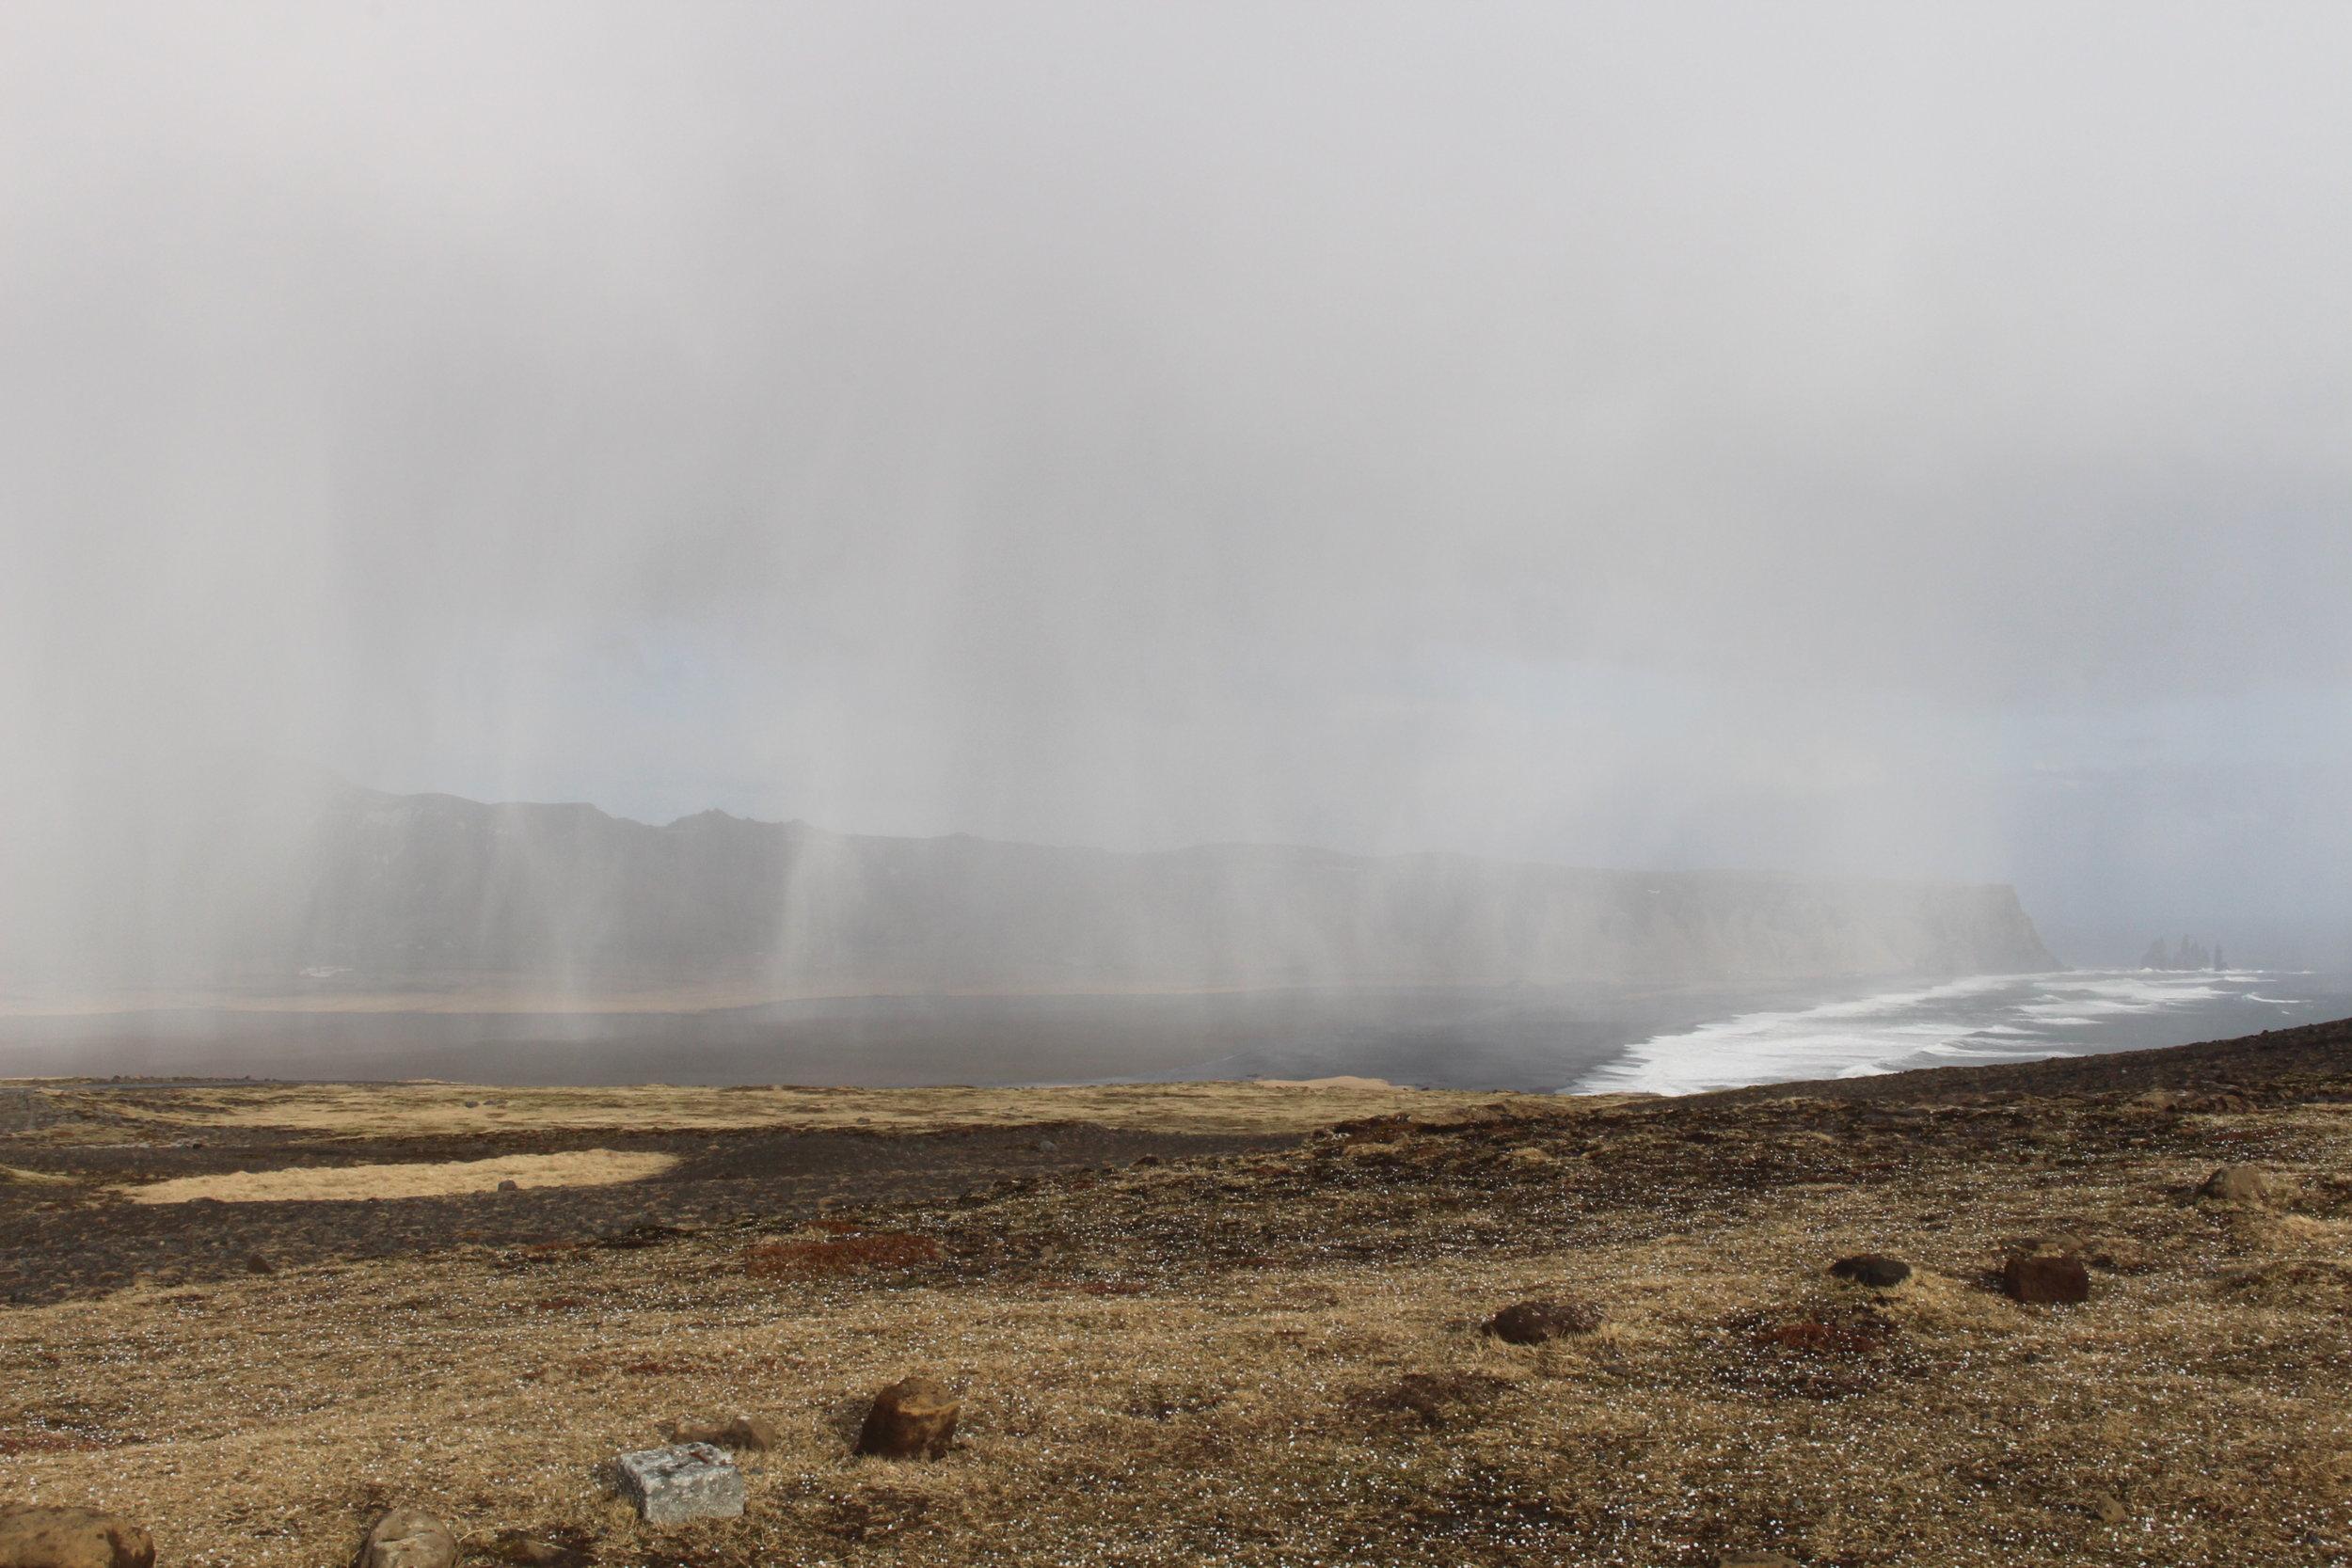 Hail storm over Reynisfjara